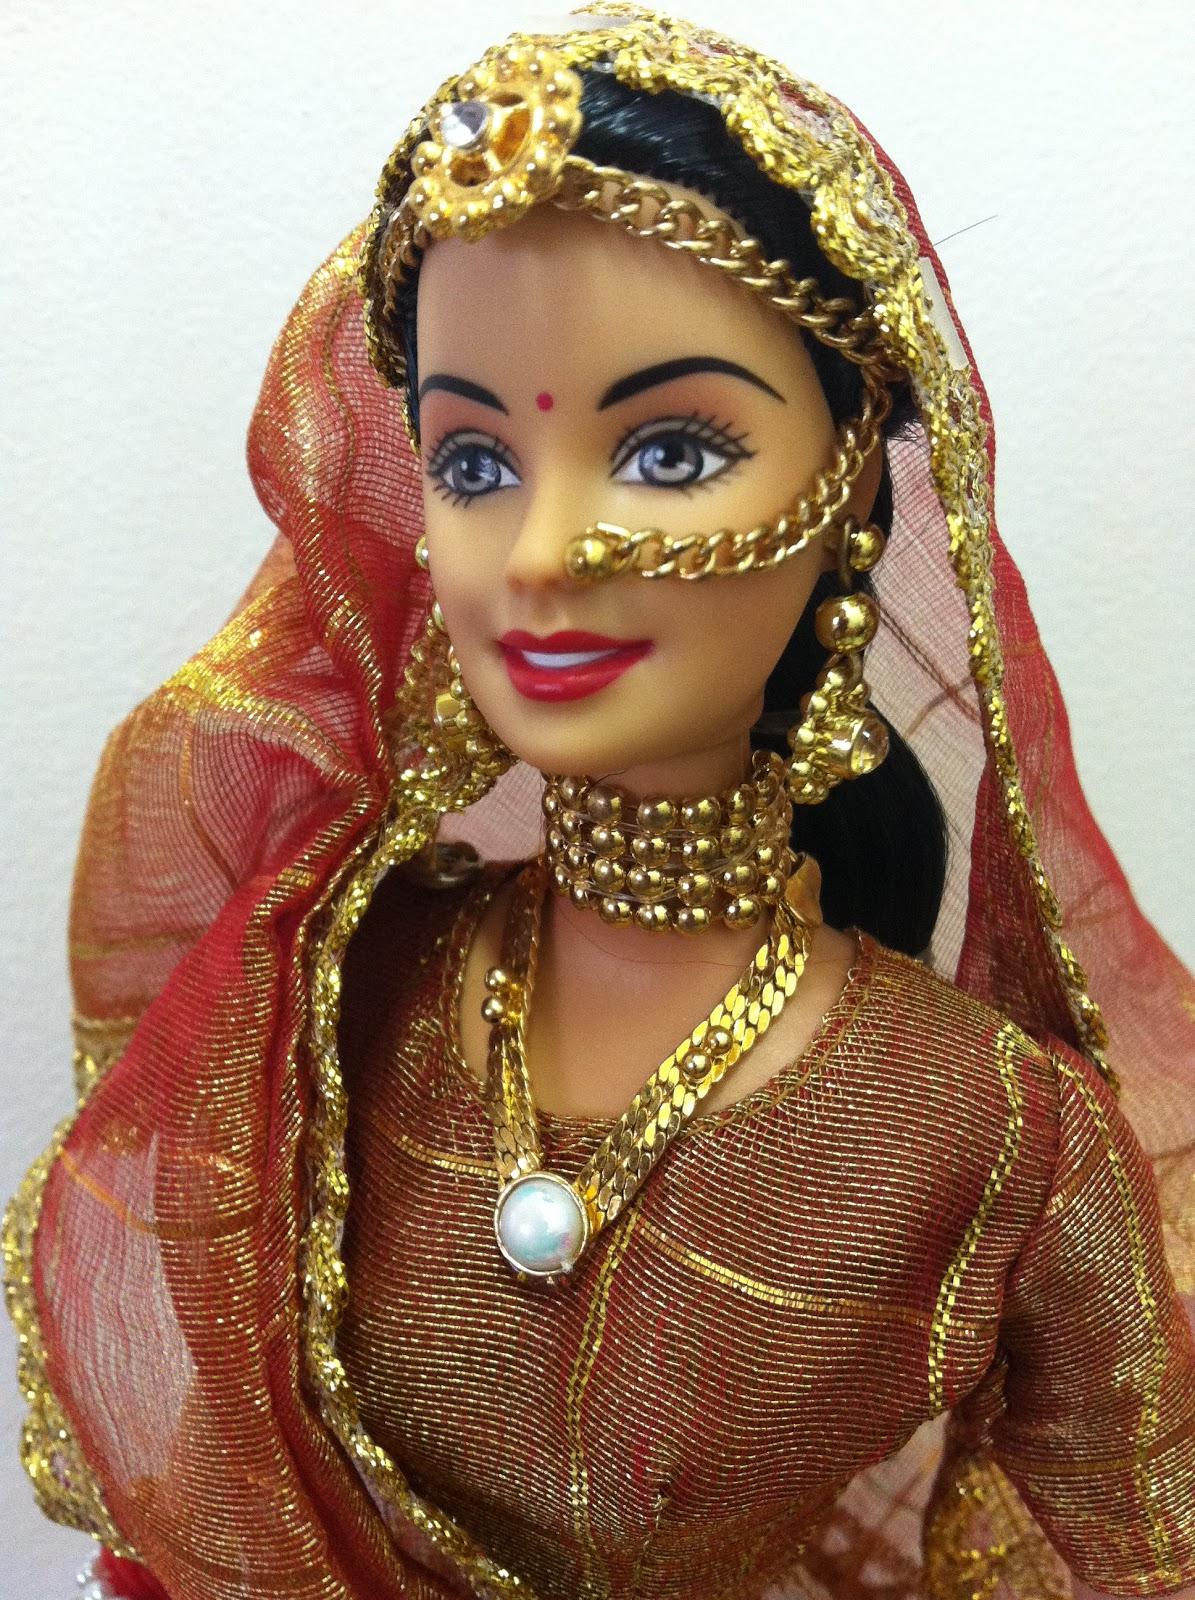 Barbie De-Boxed: Expressions of India – Wedding Fantasy